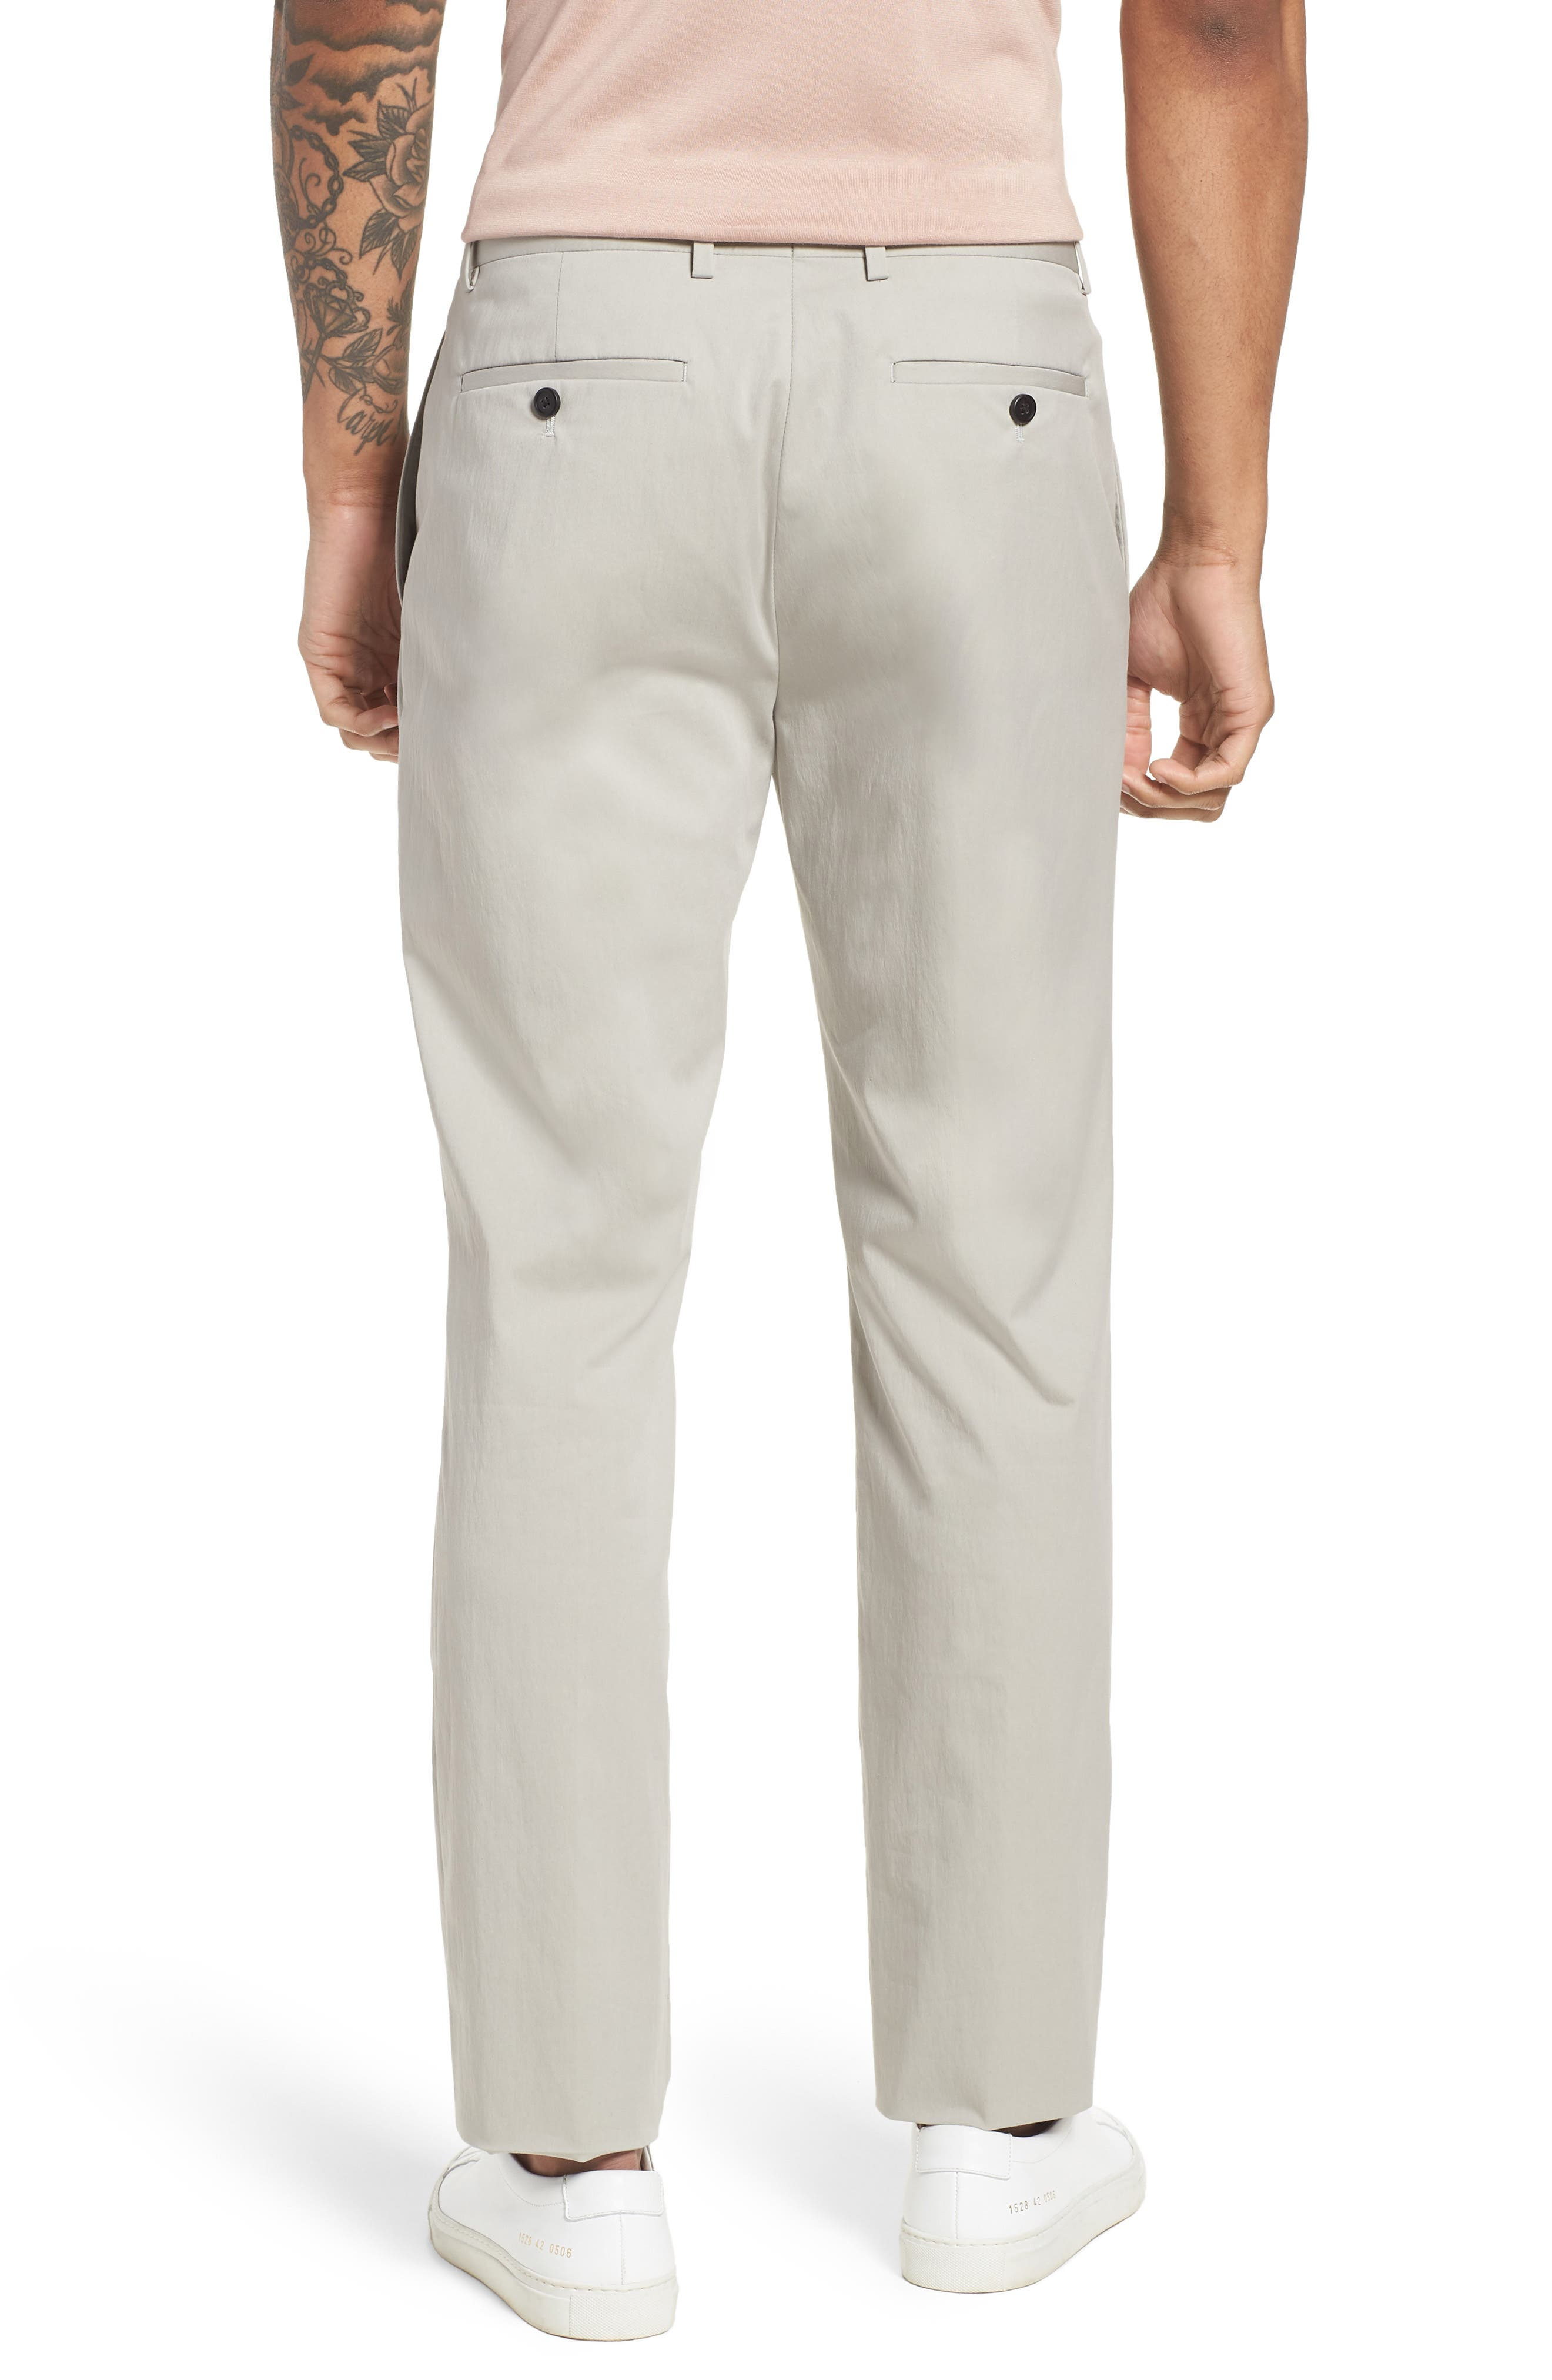 Zaine Technical Flat Front Stretch Pants,                             Alternate thumbnail 2, color,                             Ash